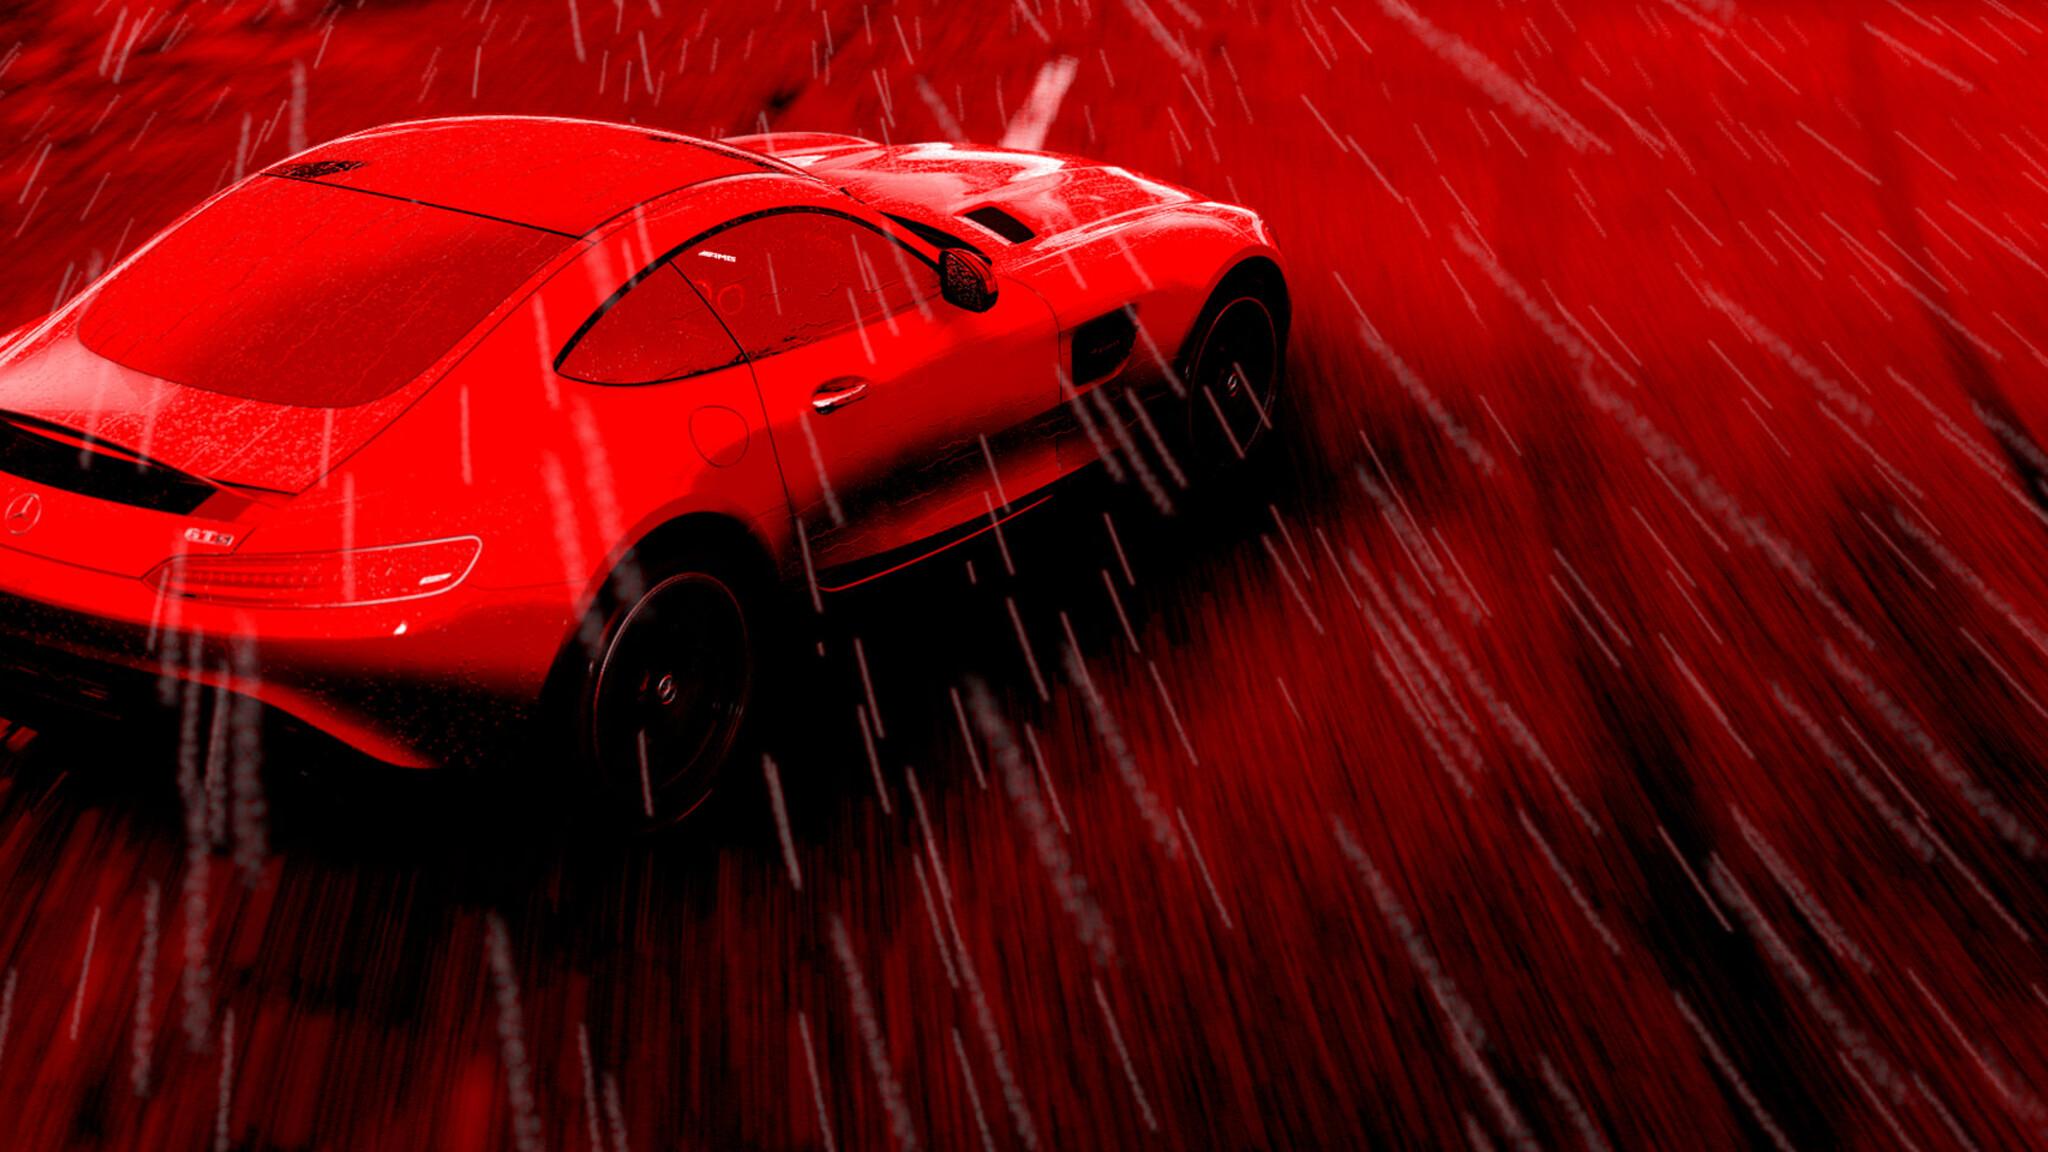 driveclub-mercedes-benz-amg-img.jpg